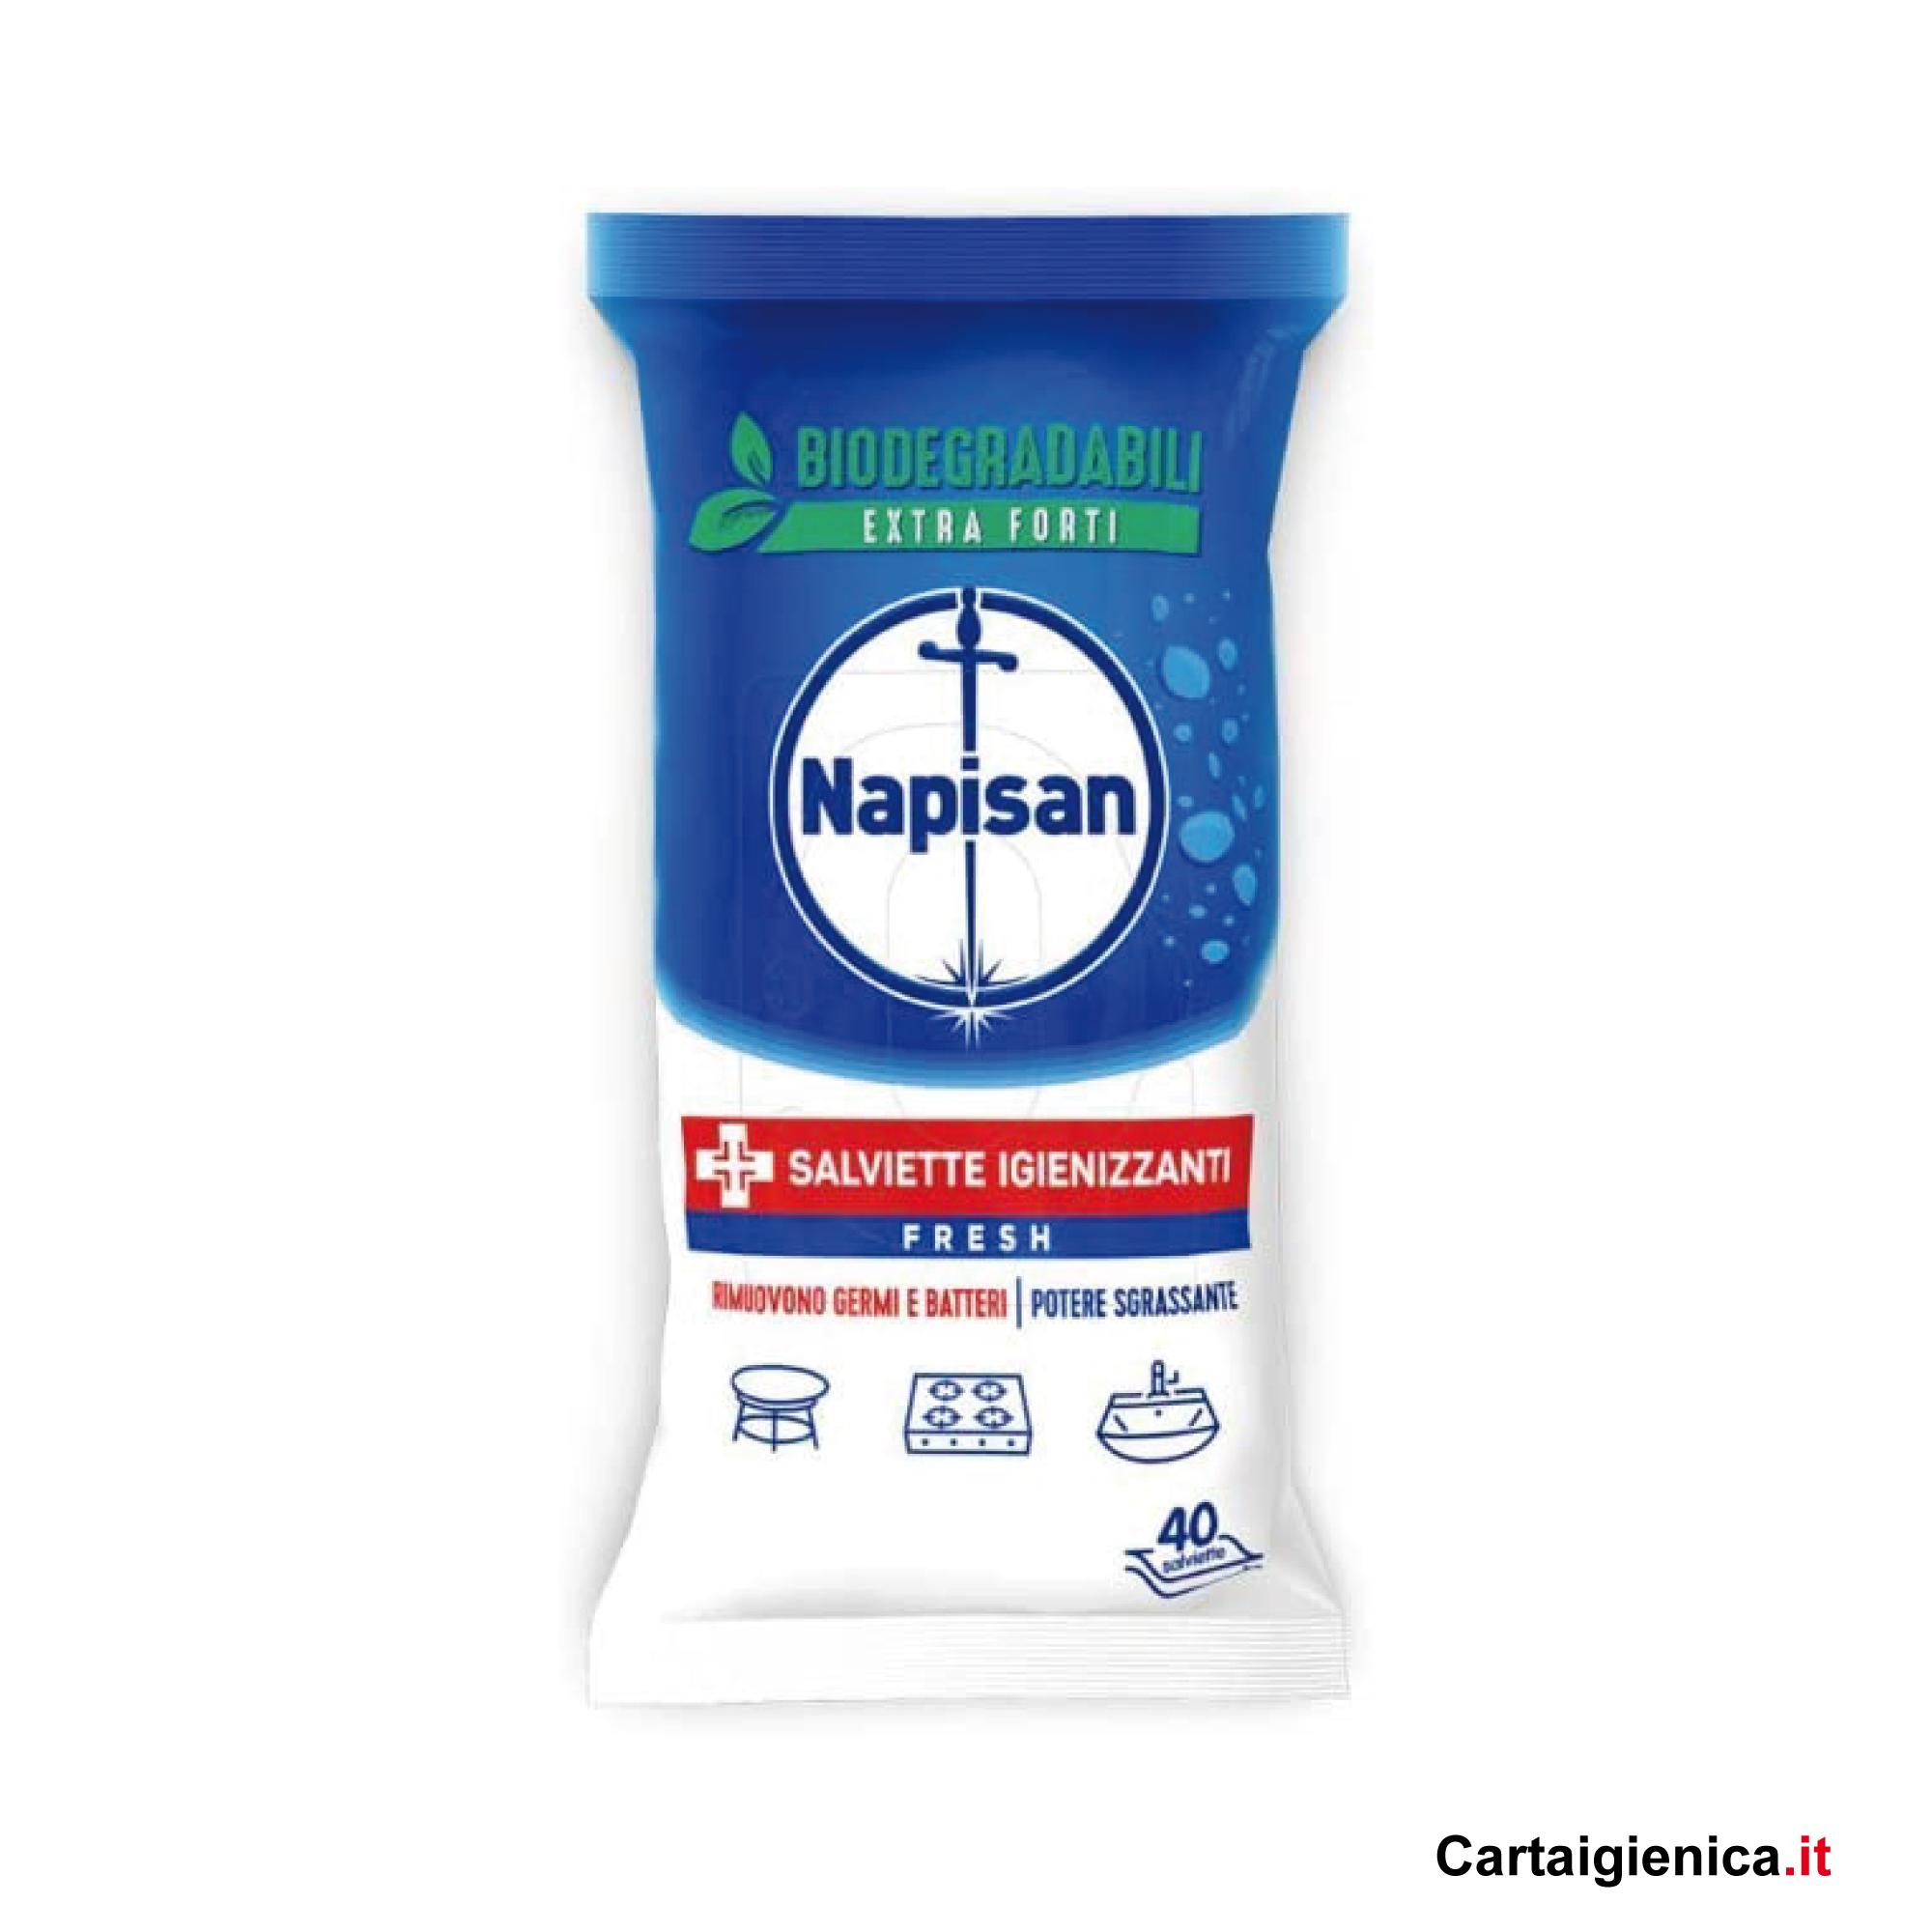 napisan salviette igienizzanti fresh rimuovono germi e batteri